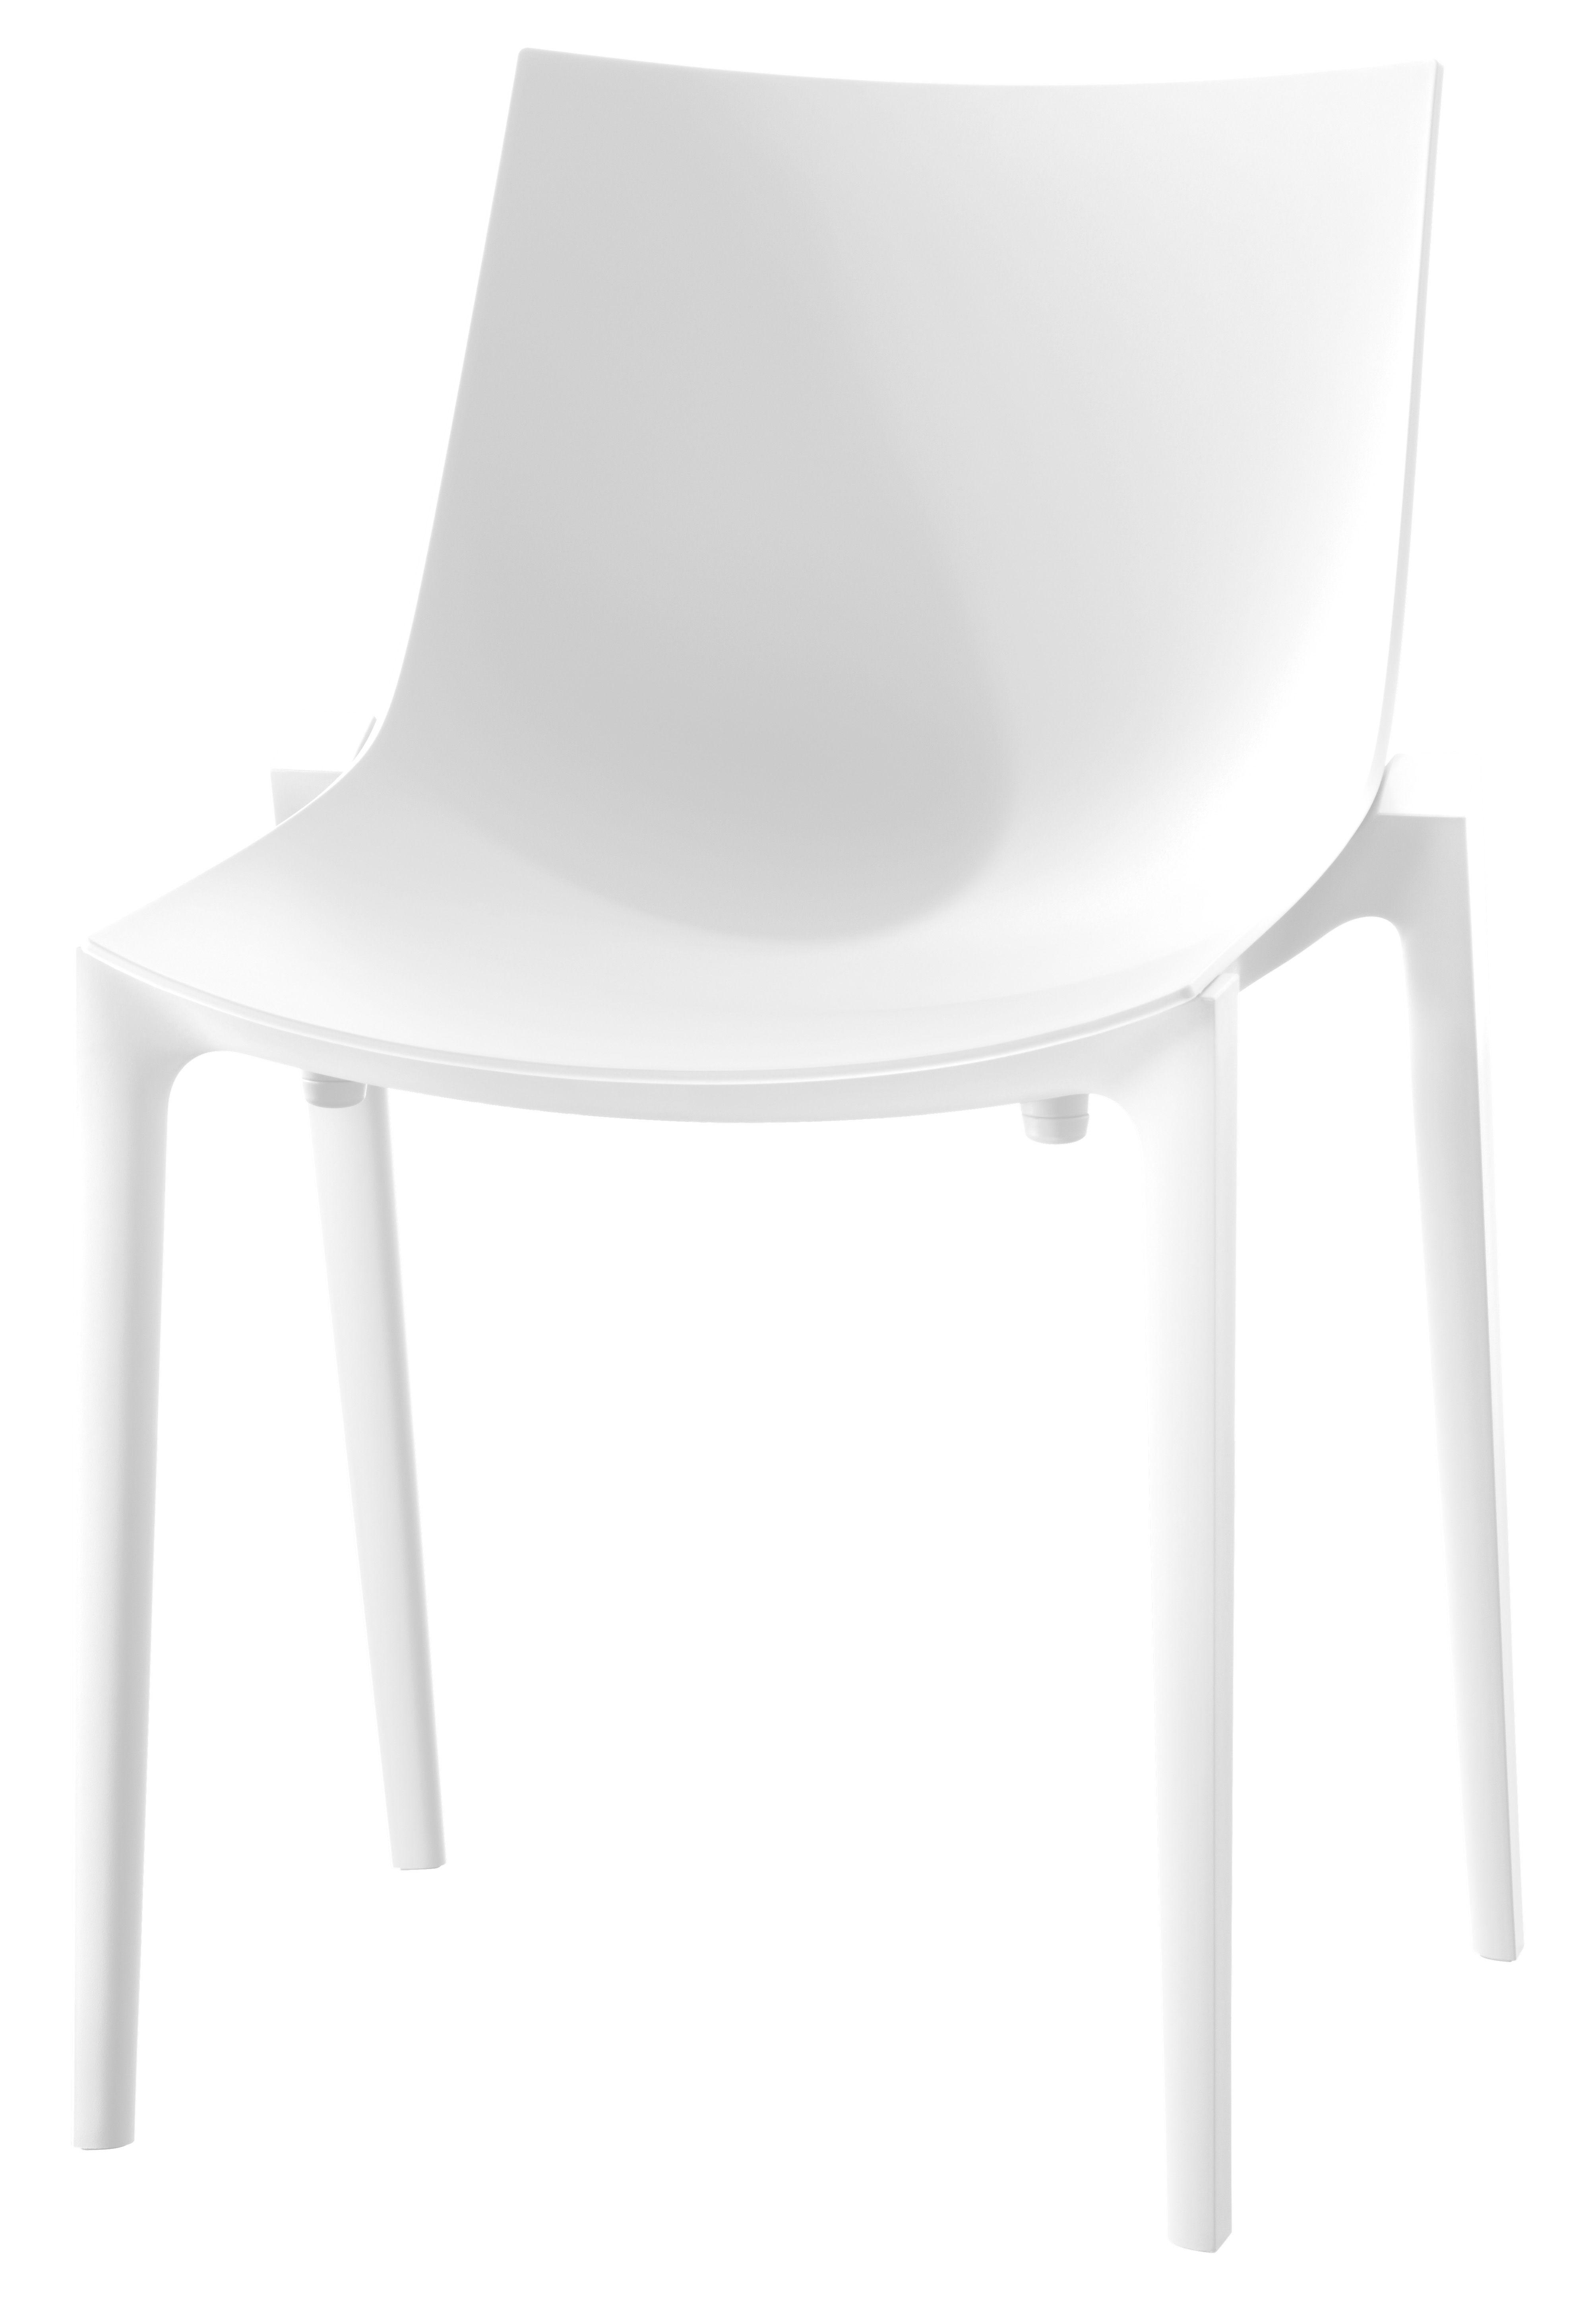 Möbel - Stühle  - Zartan Basic Stapelbarer Stuhl / Polypropylen - Magis - Weiß - Glasfaser, Polypropylen